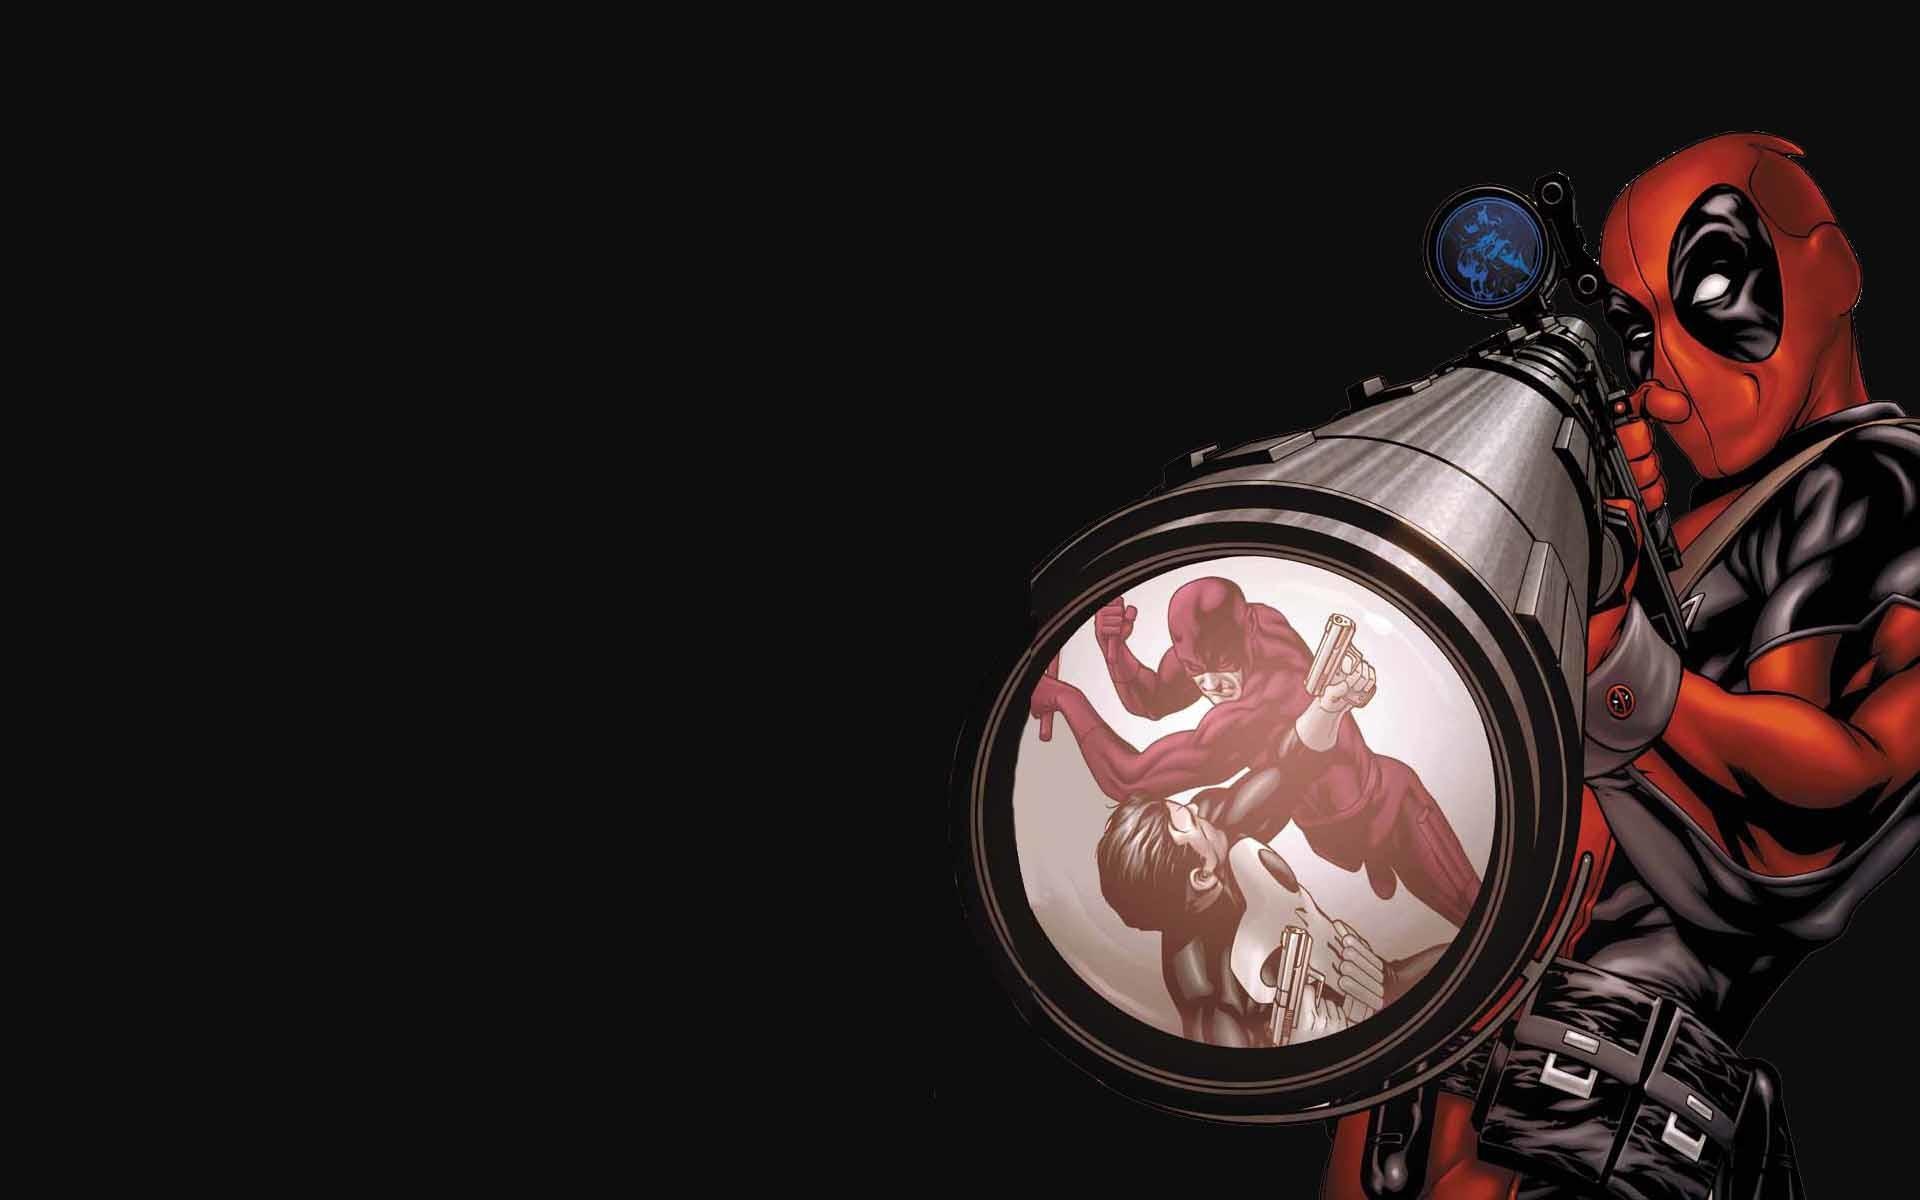 Deadpool Wallpaper For Iphone X Deadpool Wallpaper Hd 72 Images